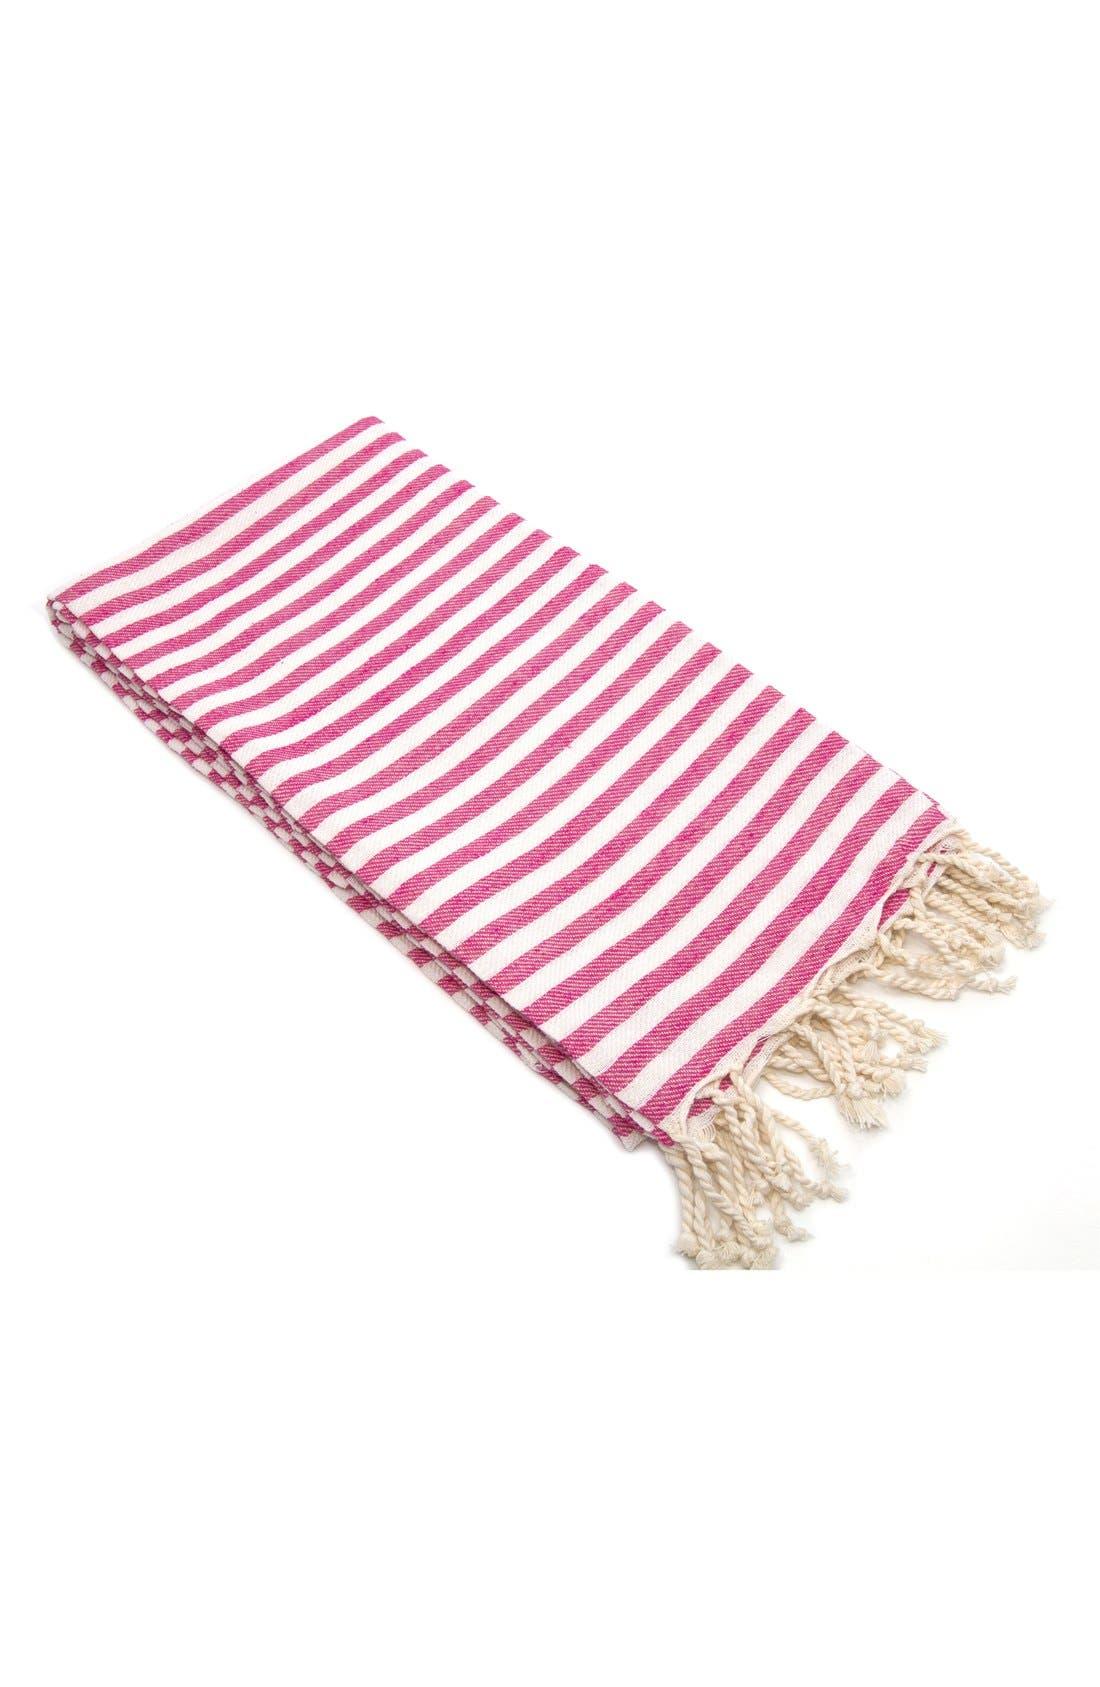 'Fun in the Sun' Turkish Pestemal Towel, Main, color, 650